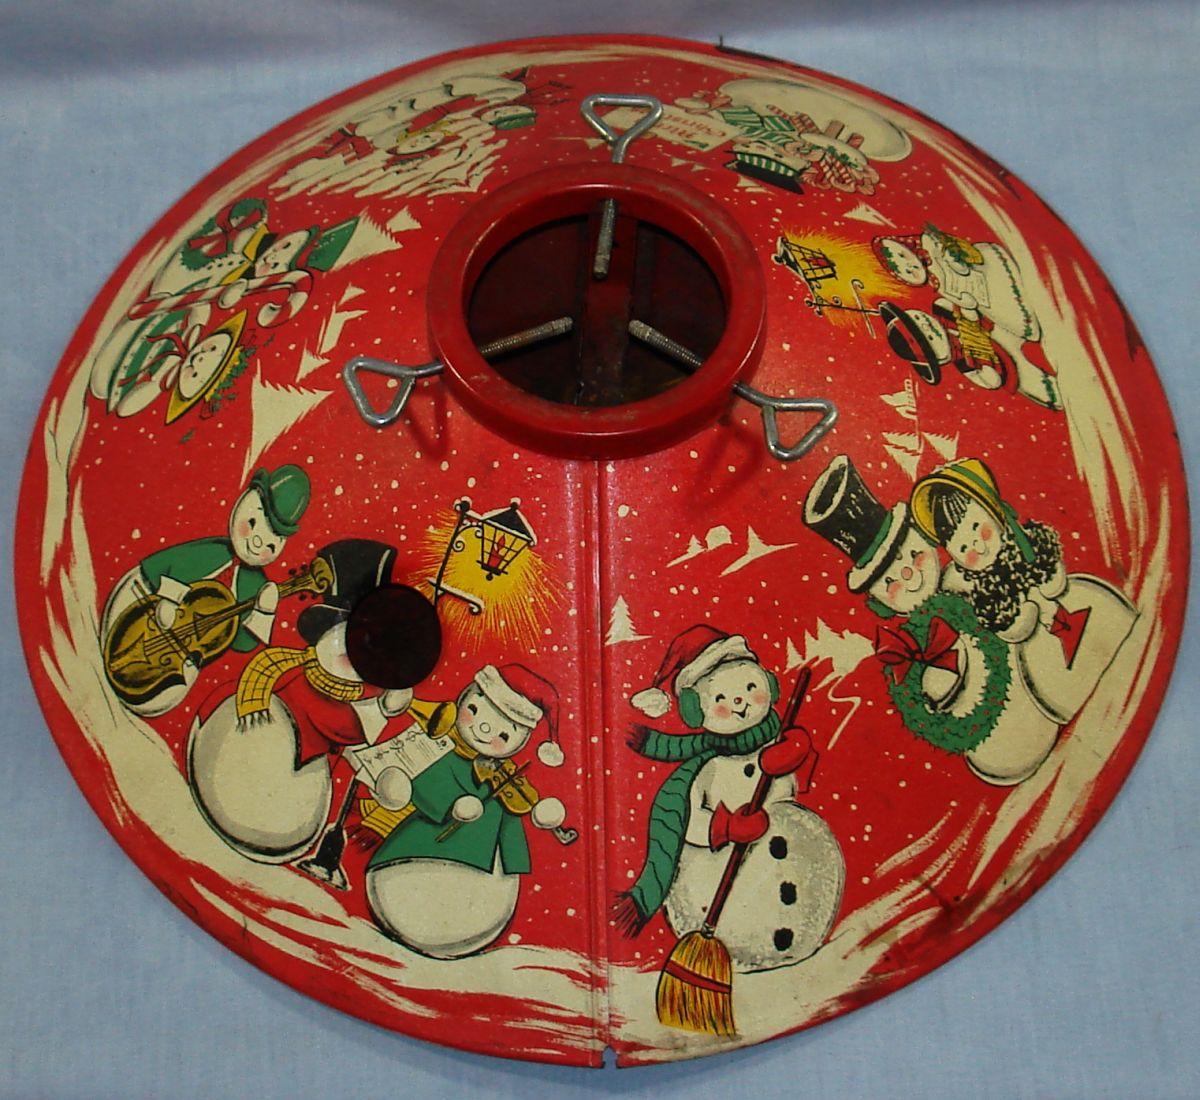 More on Antique Christmas Stands - Picture Unique Arts